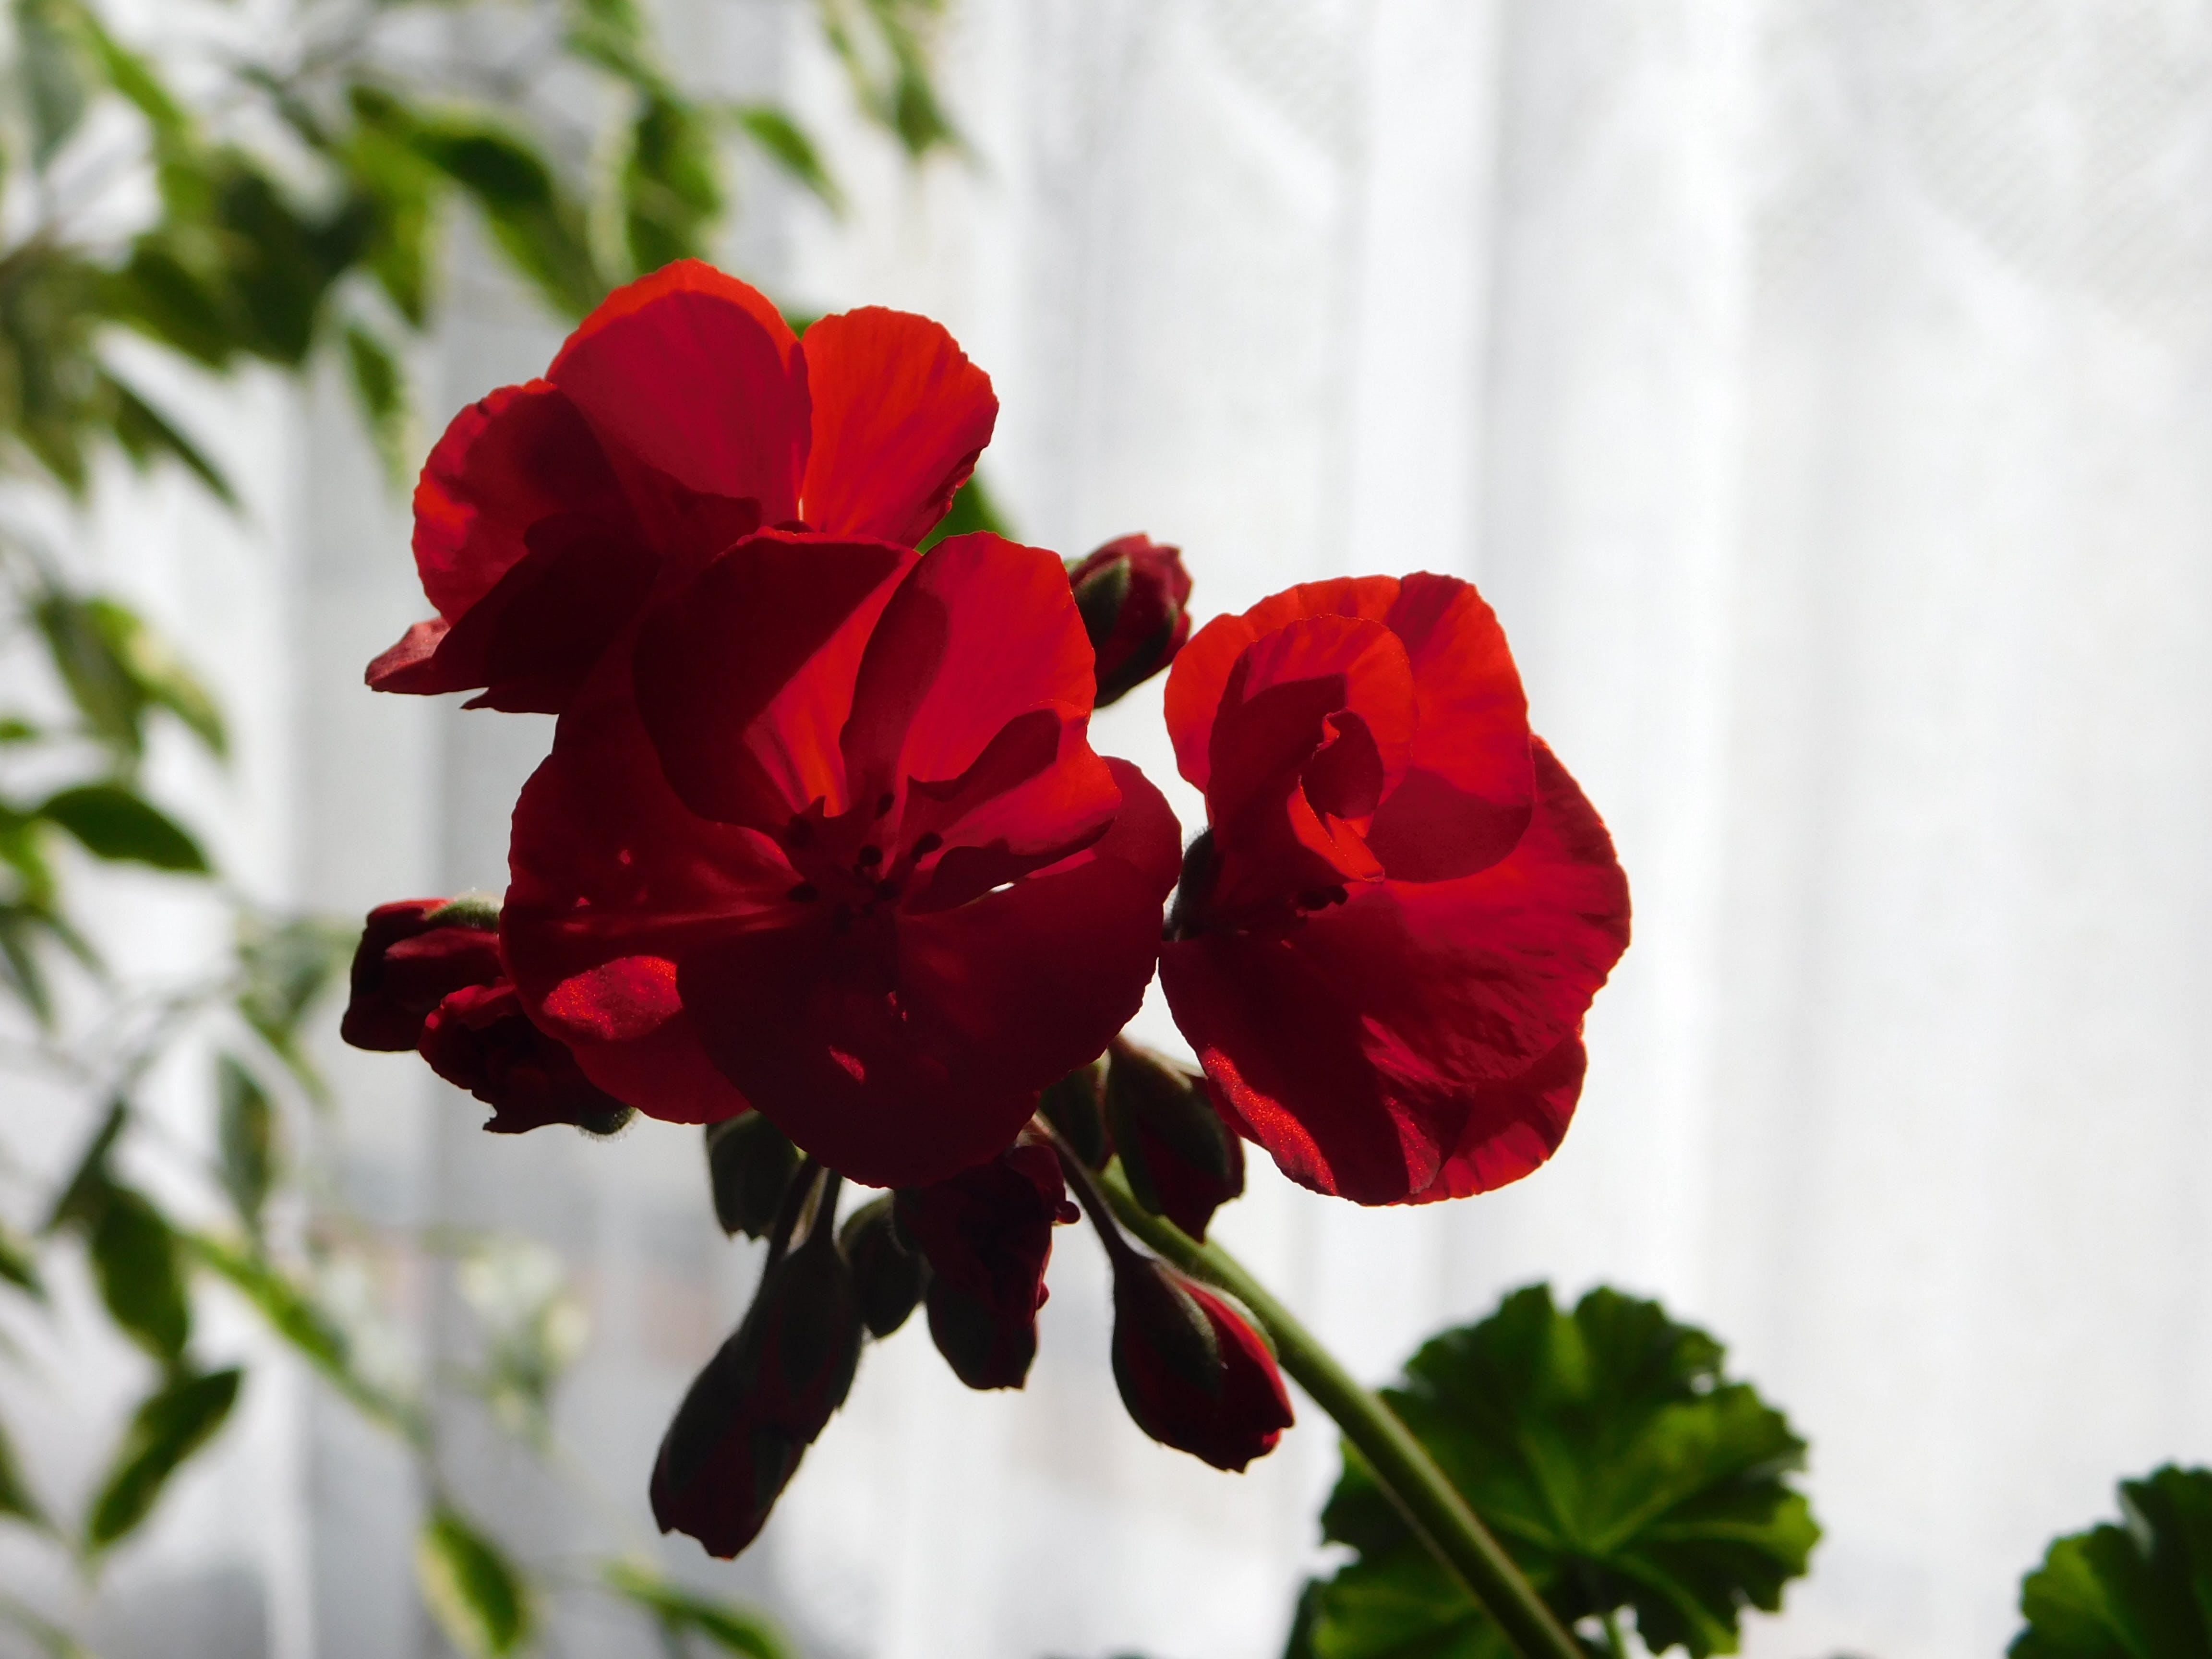 Free stock photo of home grown geranium